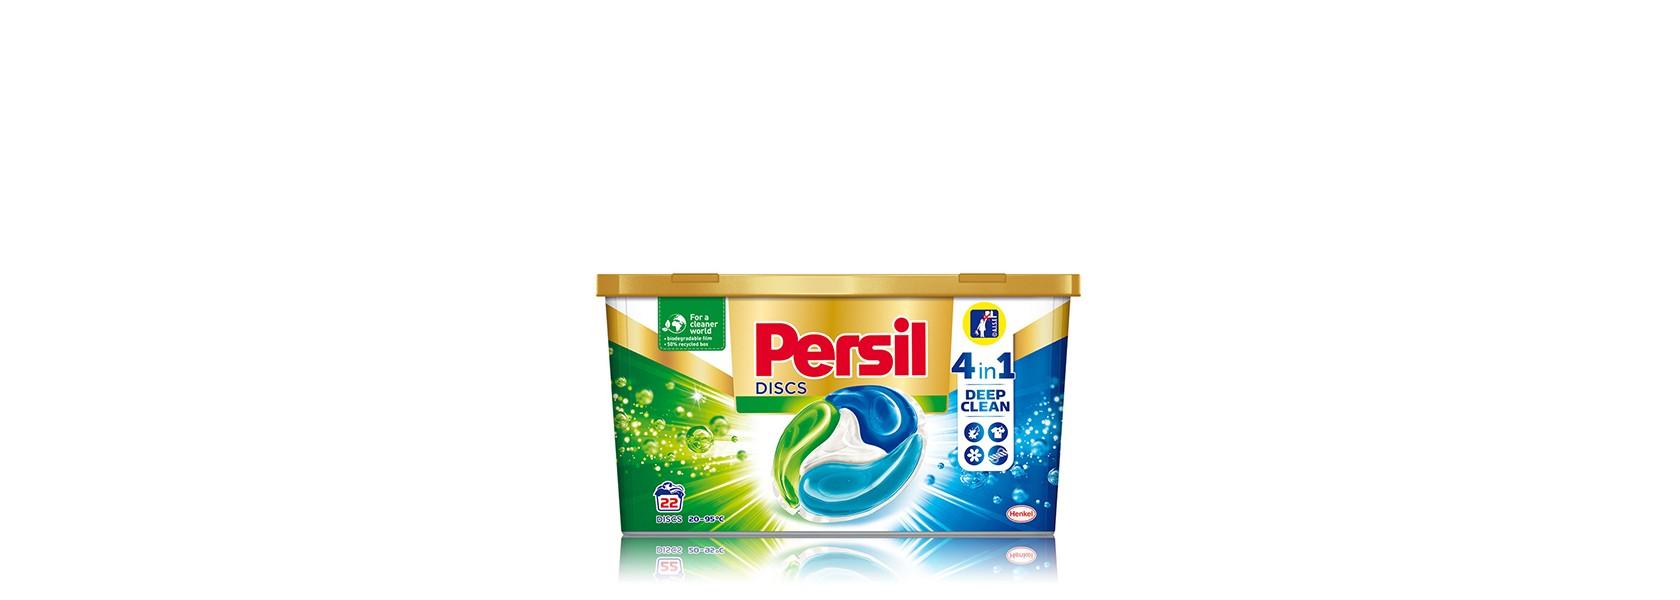 persil-discs-universal